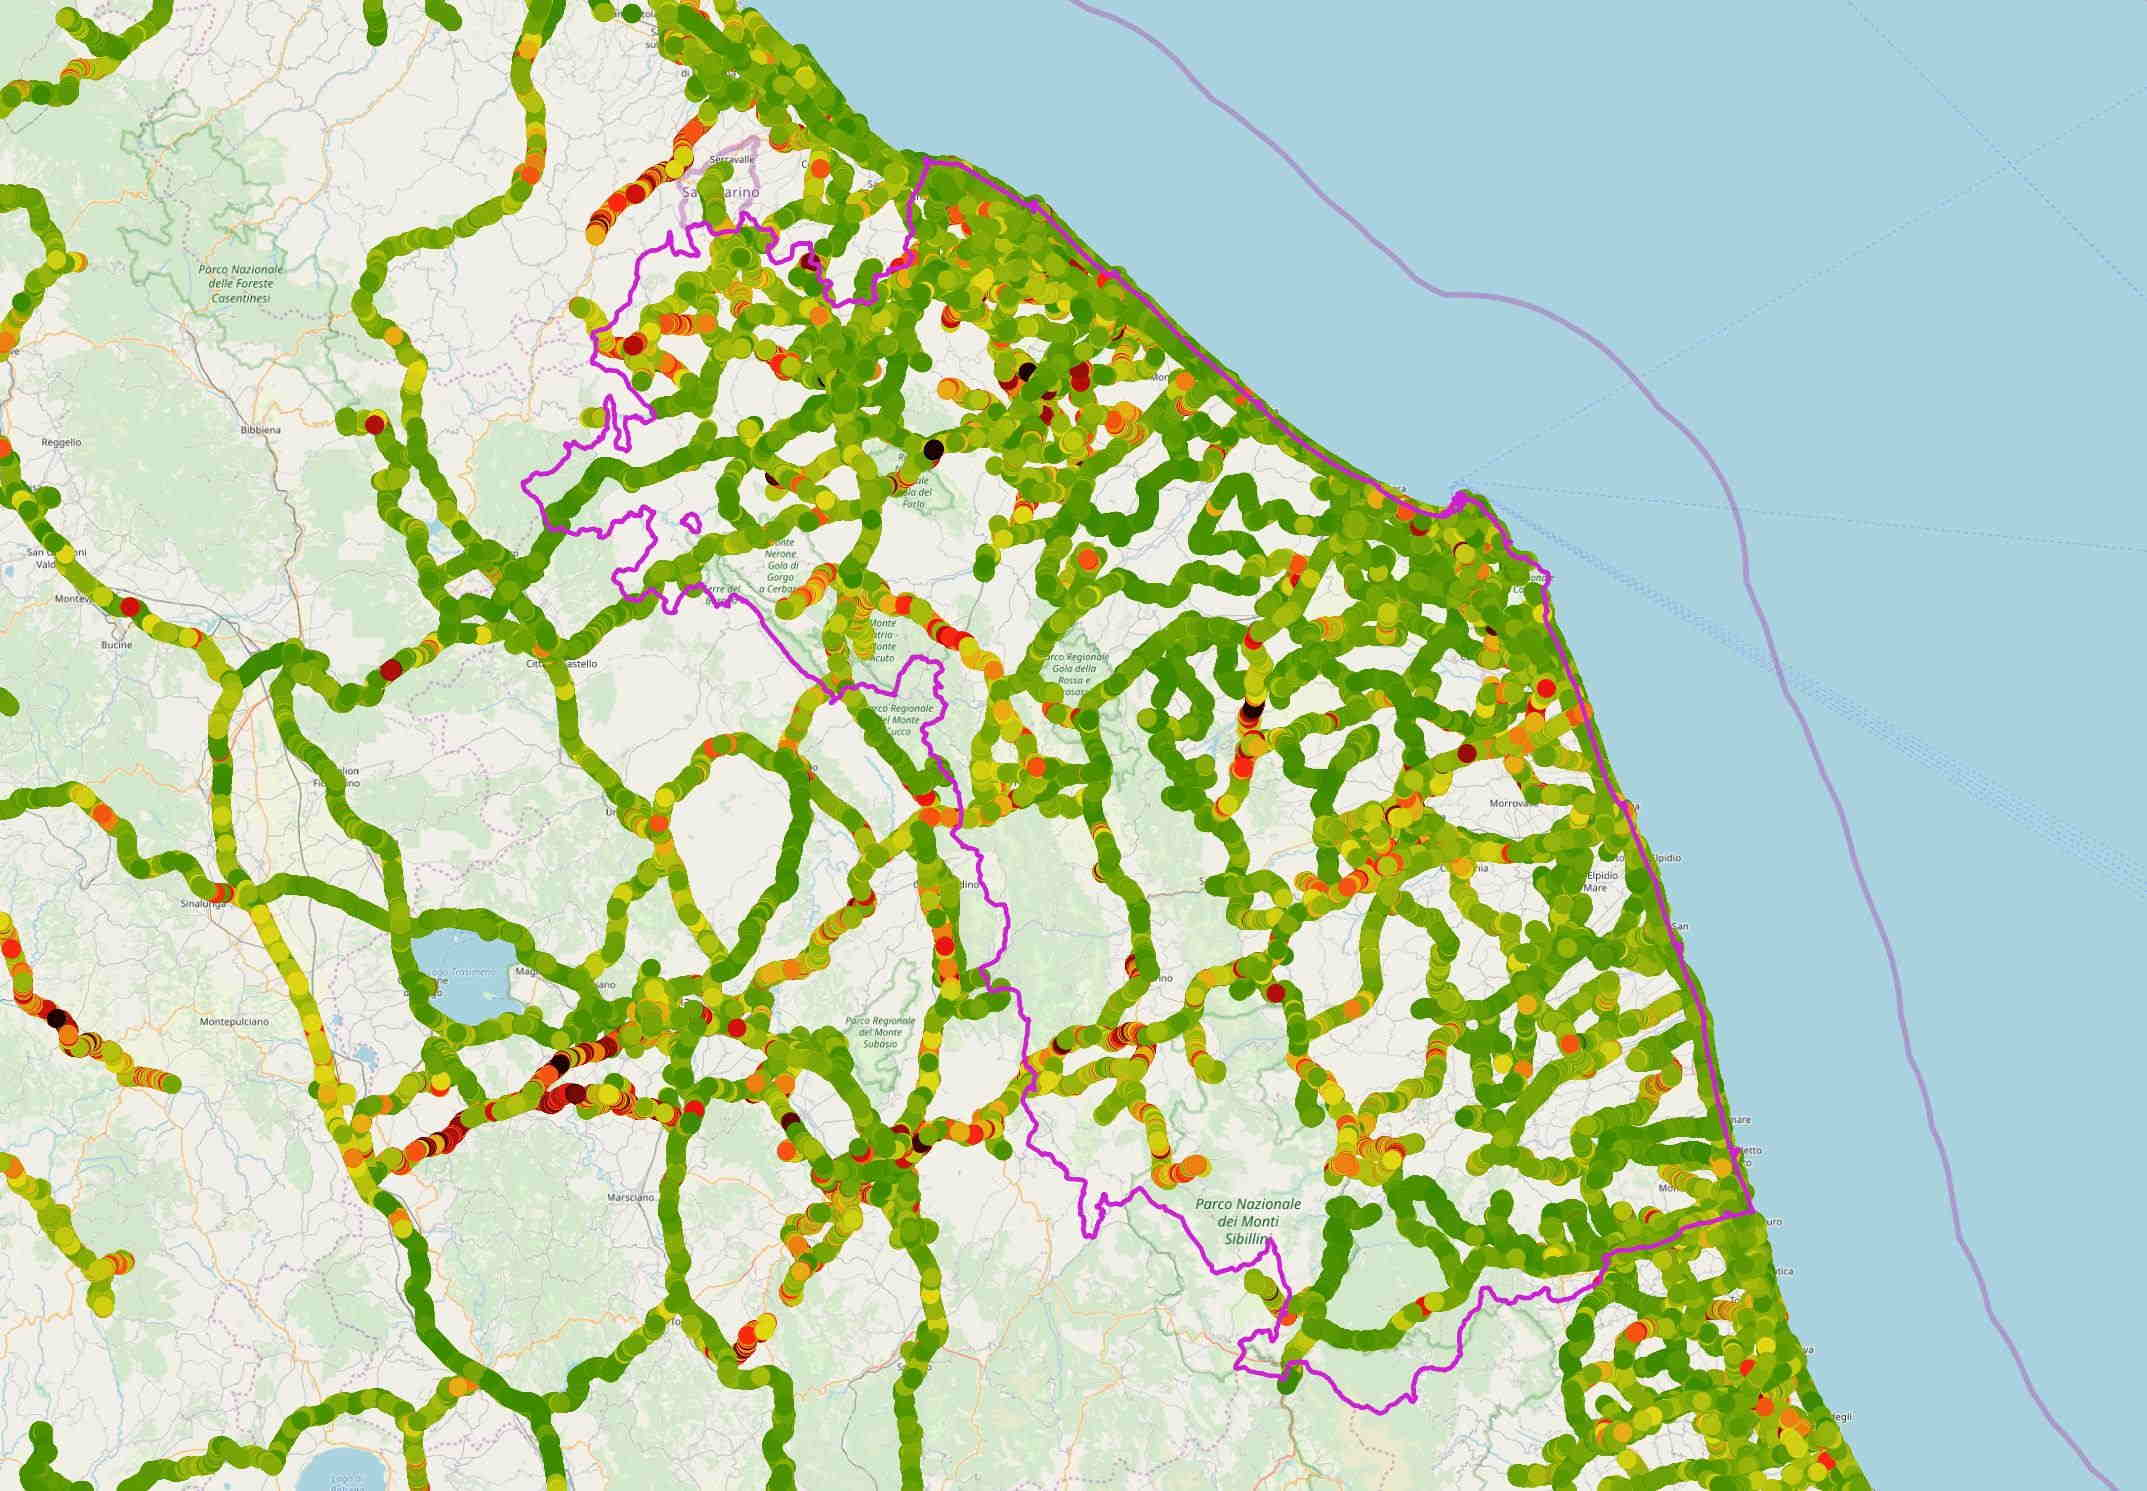 Marche Cartina Stradale.Regione Marche Regione Utile Agenda Digitale Crowd4roads